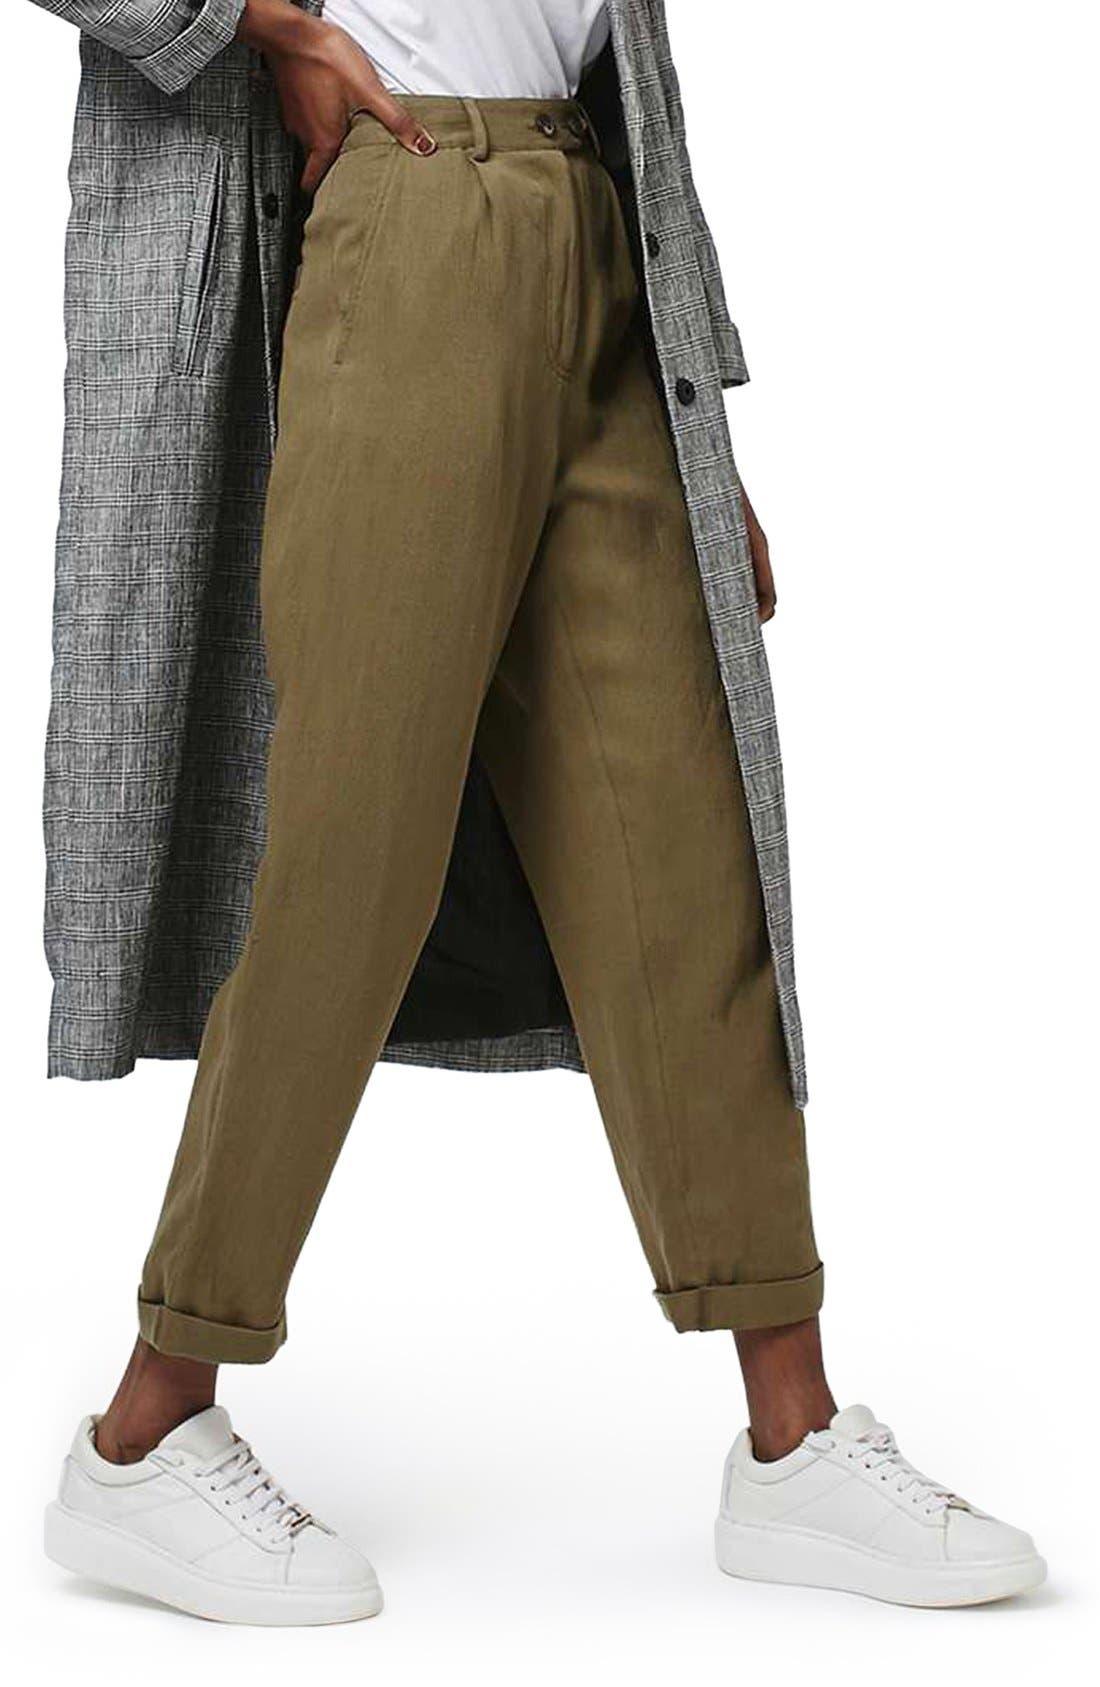 Main Image - Topshop 'Mensy' Corduroy Peg Trousers